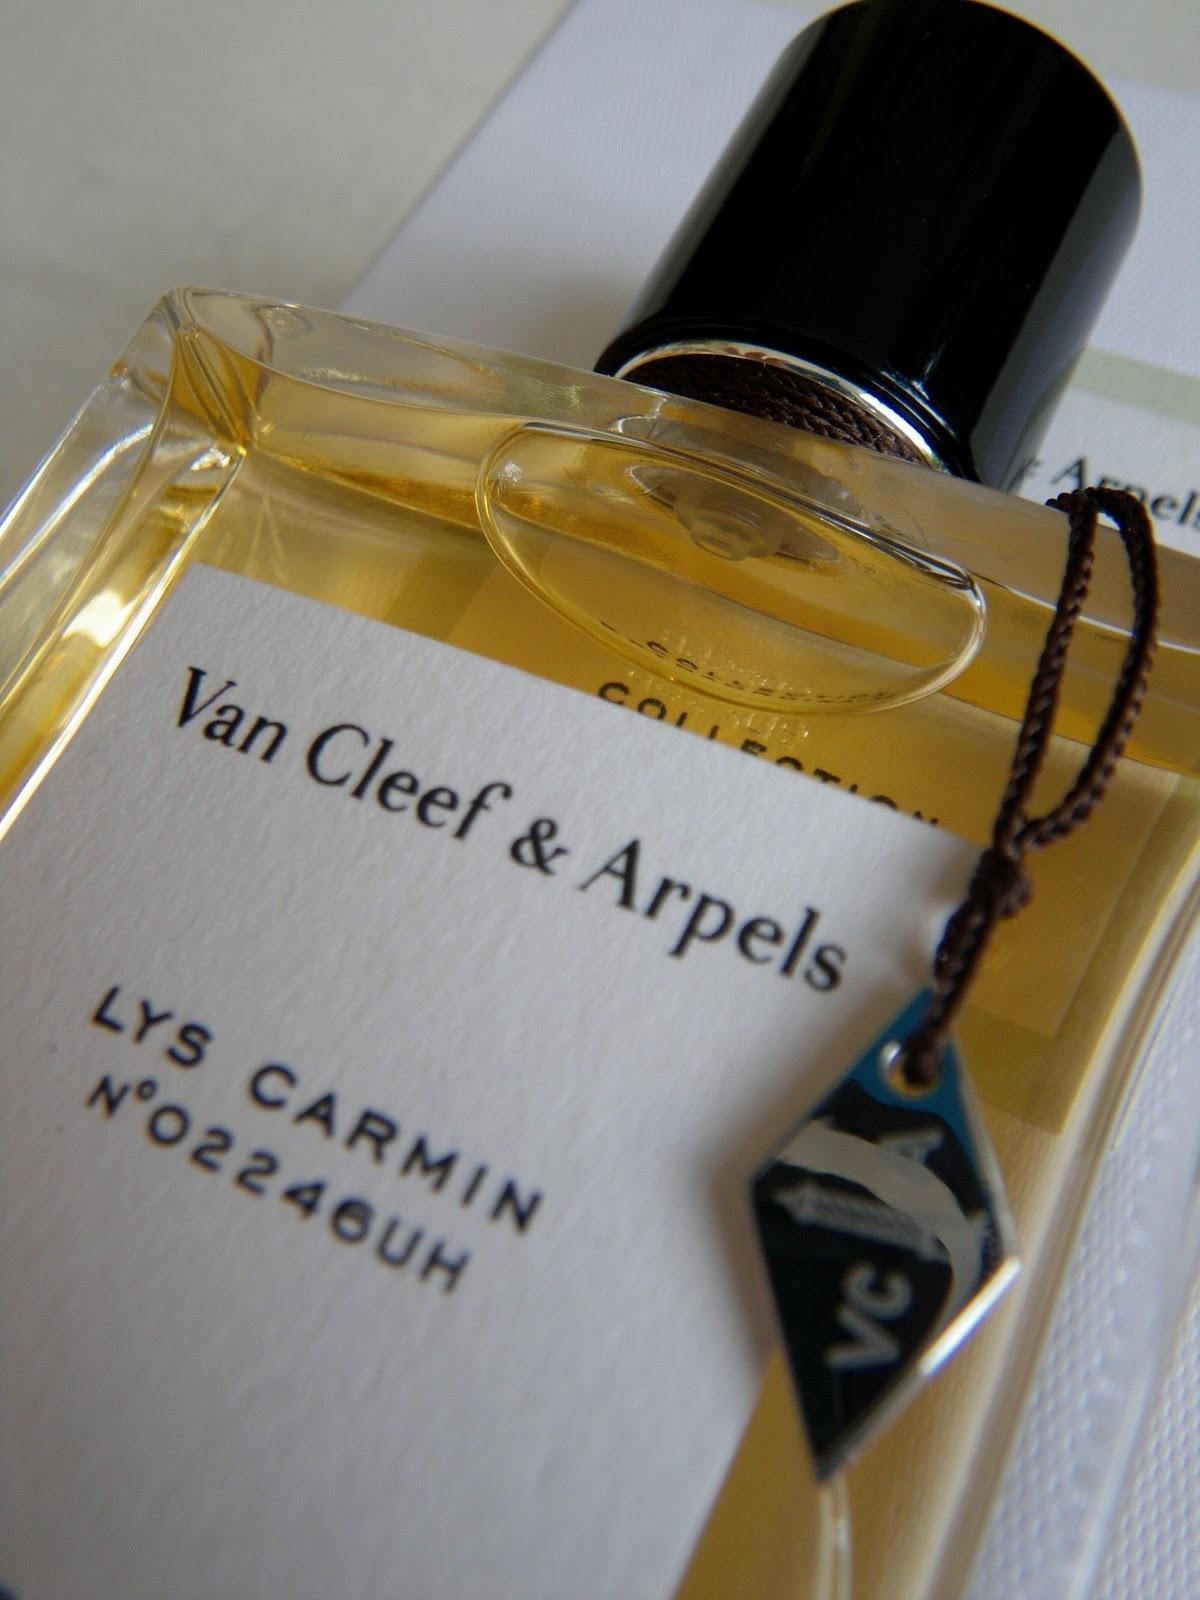 LYS CARMIN by Van Cleef Arpel 5ml Travel Spray Perfume Vanilla Ylang Pepper